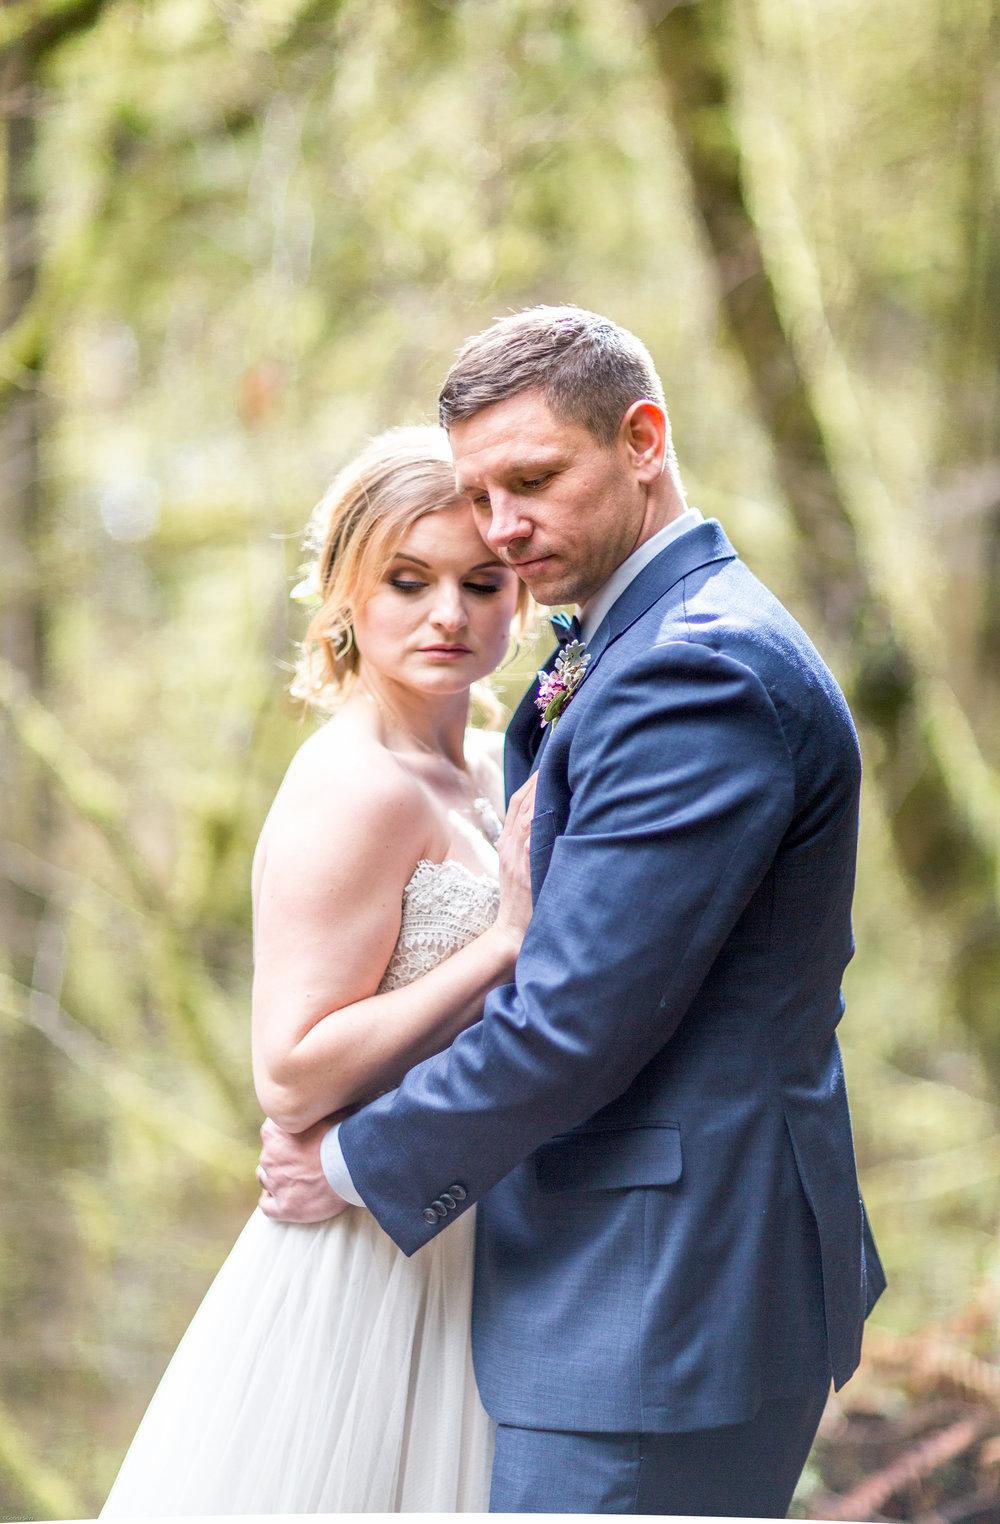 Silver Falls-elopement-bride-and-groom-photo Corina Silva Studios-68.jpg